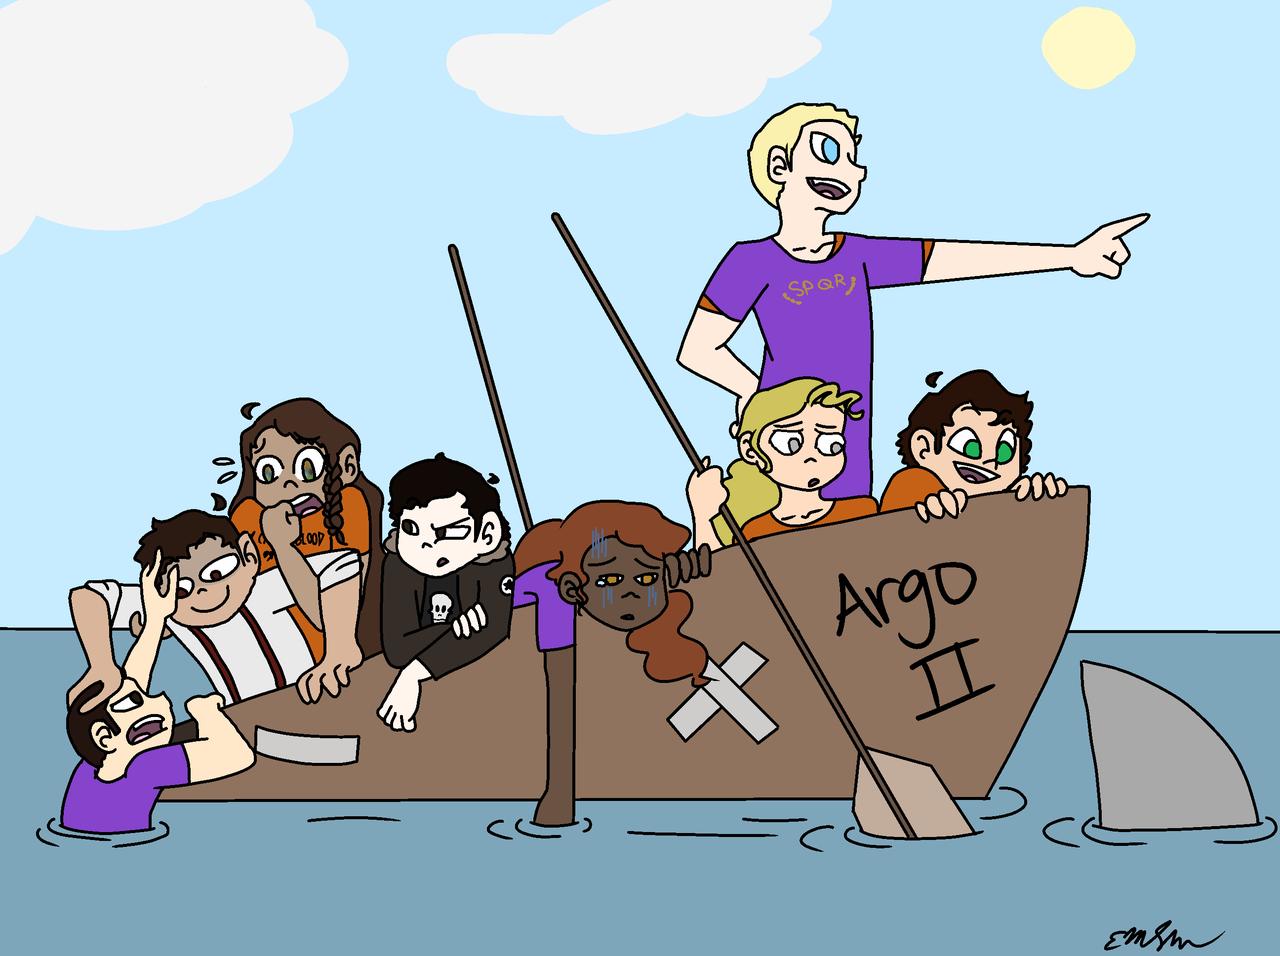 The 7 plus Nico - Draw the Squad - welp  | Illustrations - ART